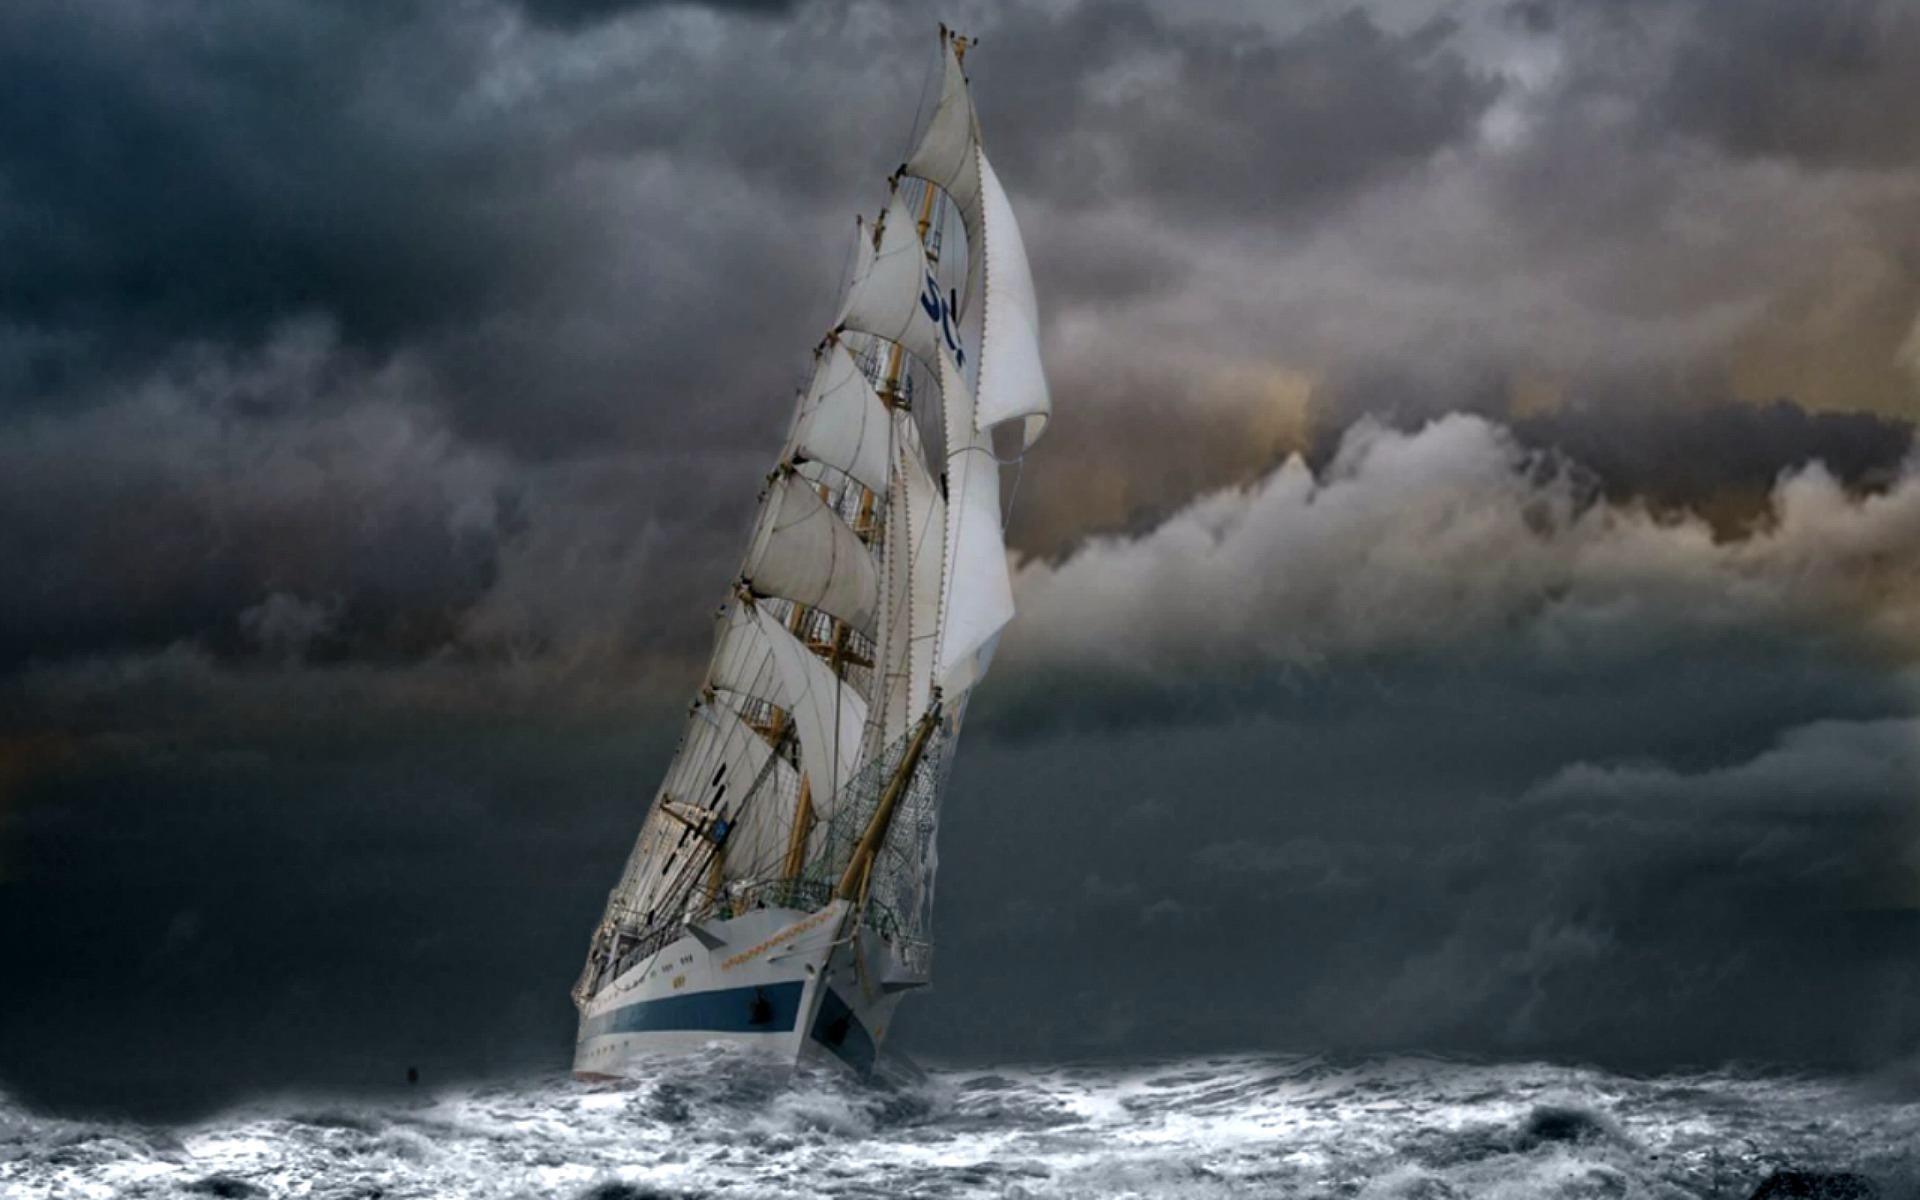 Vehicles – Sailing Ship Vehicle Sailboat Ship Storm Wave Ocean Cloud  Wallpaper